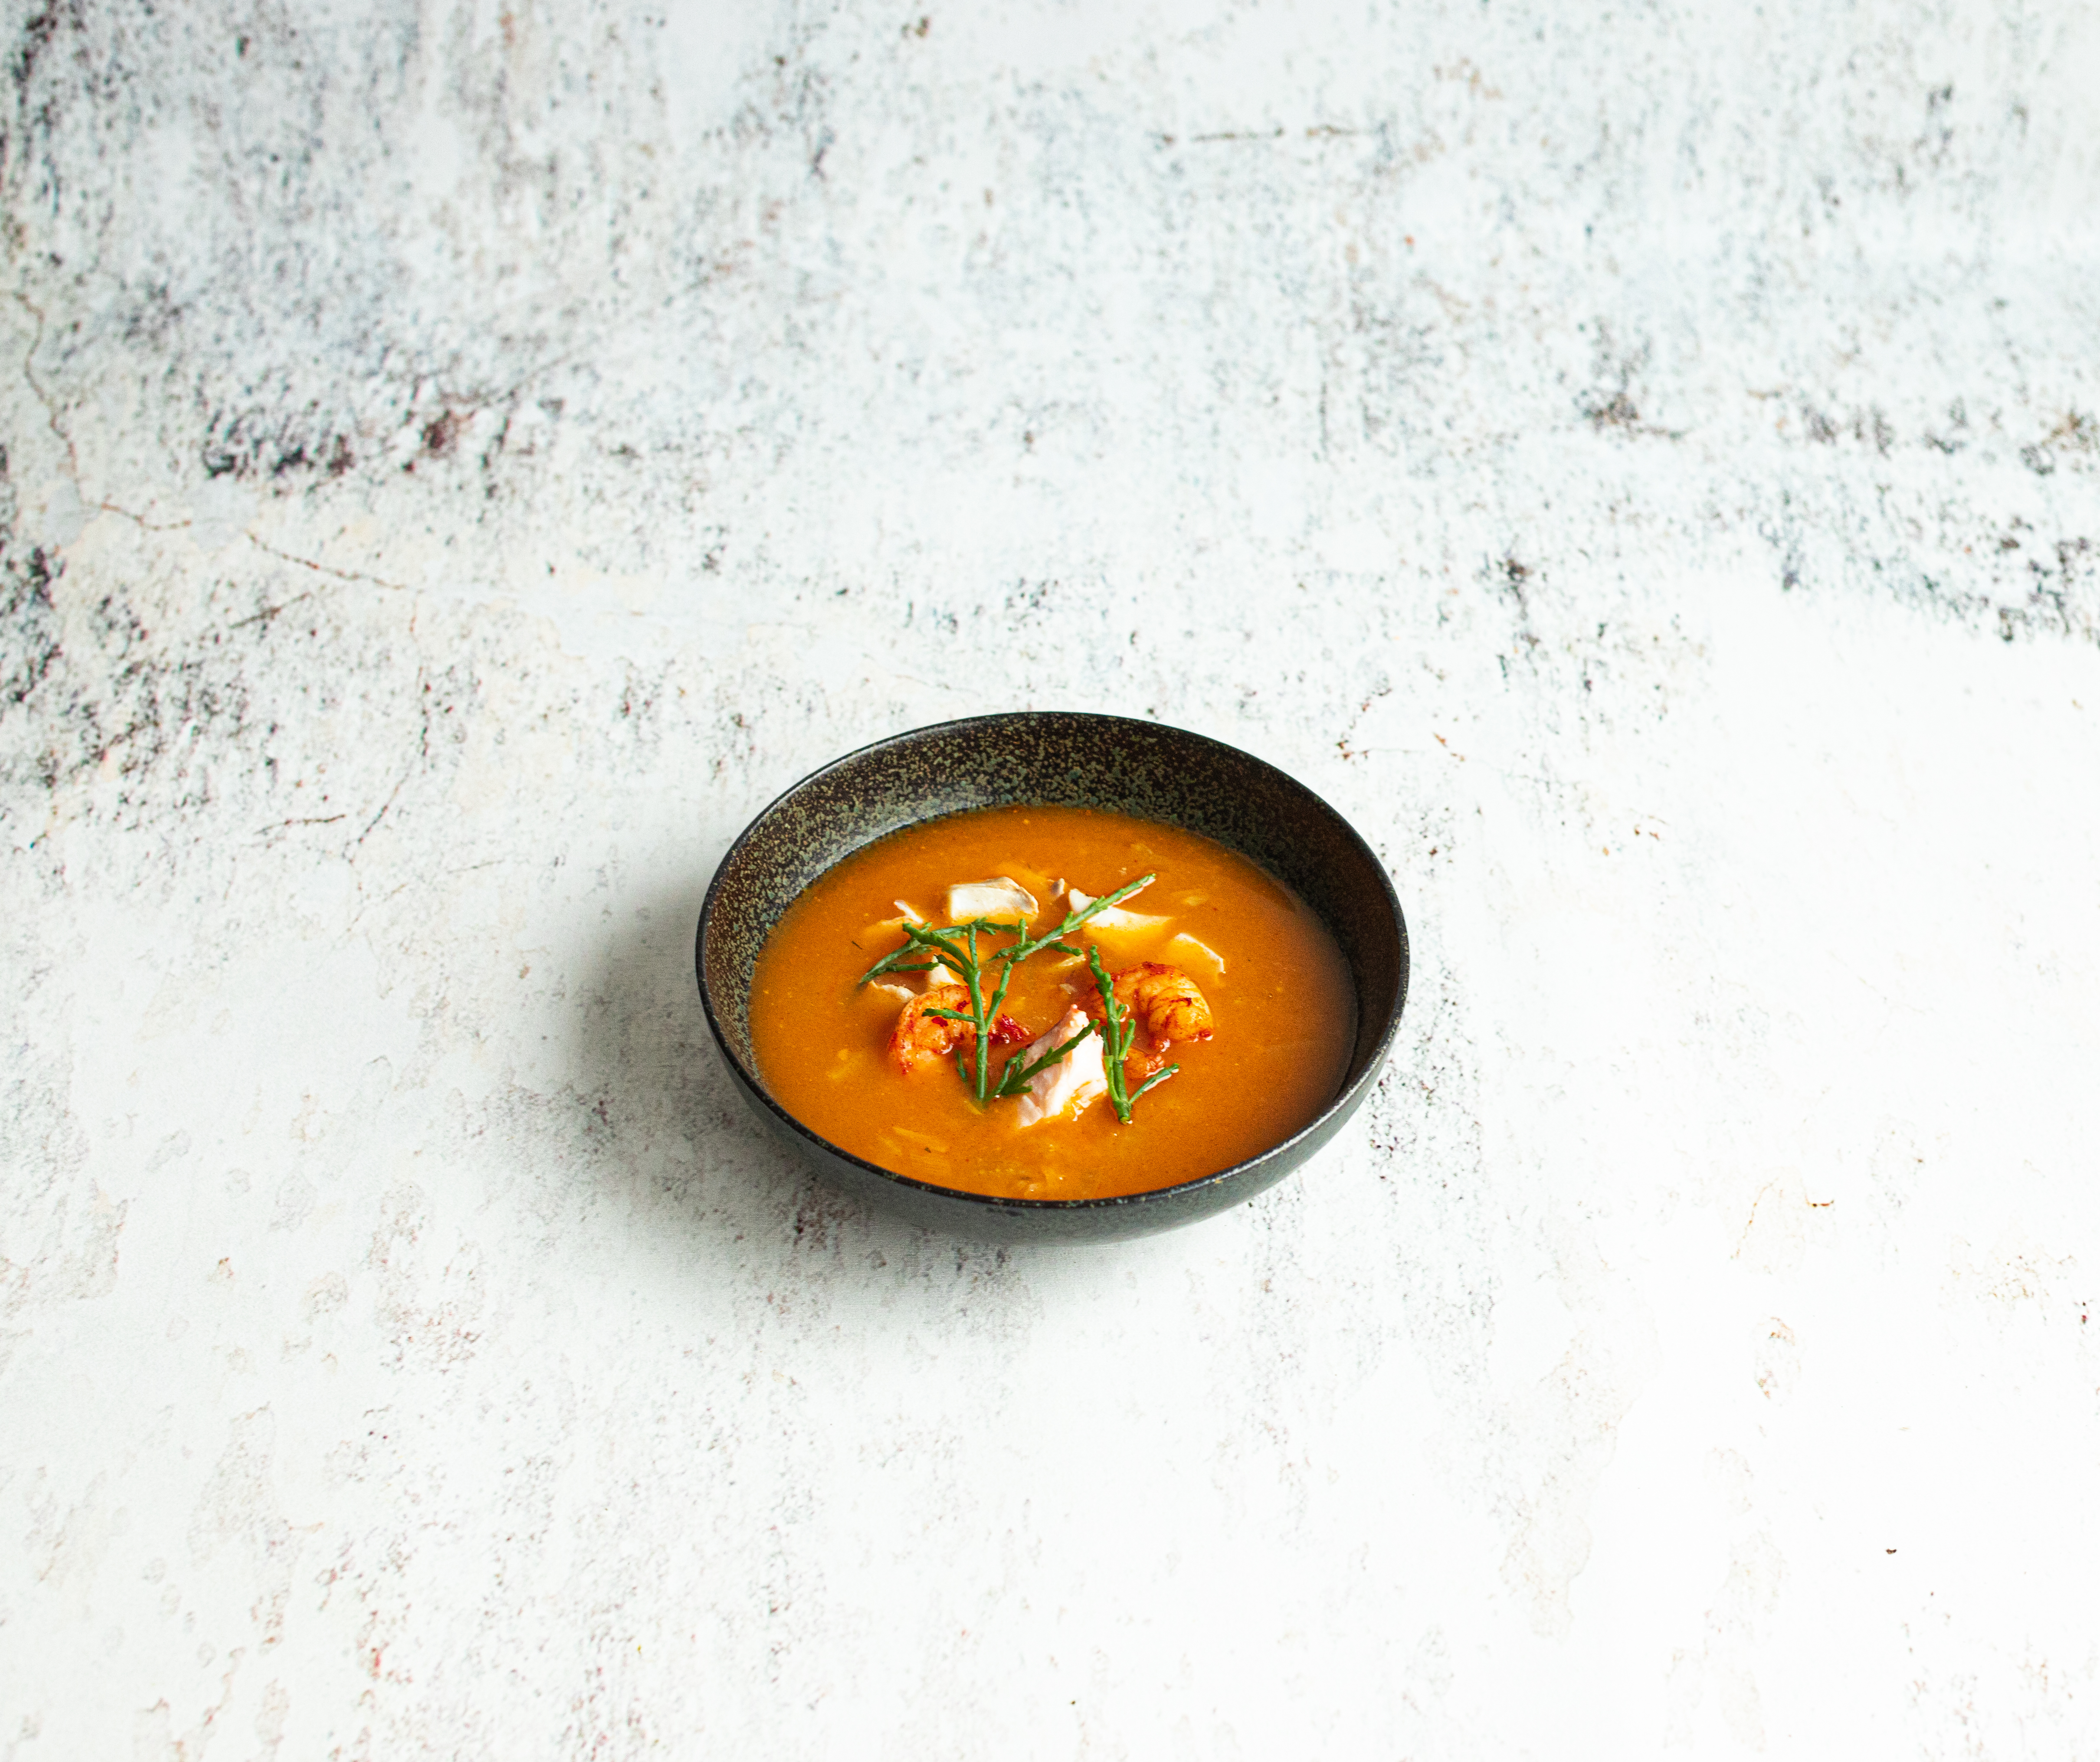 Bouillabaisse soep